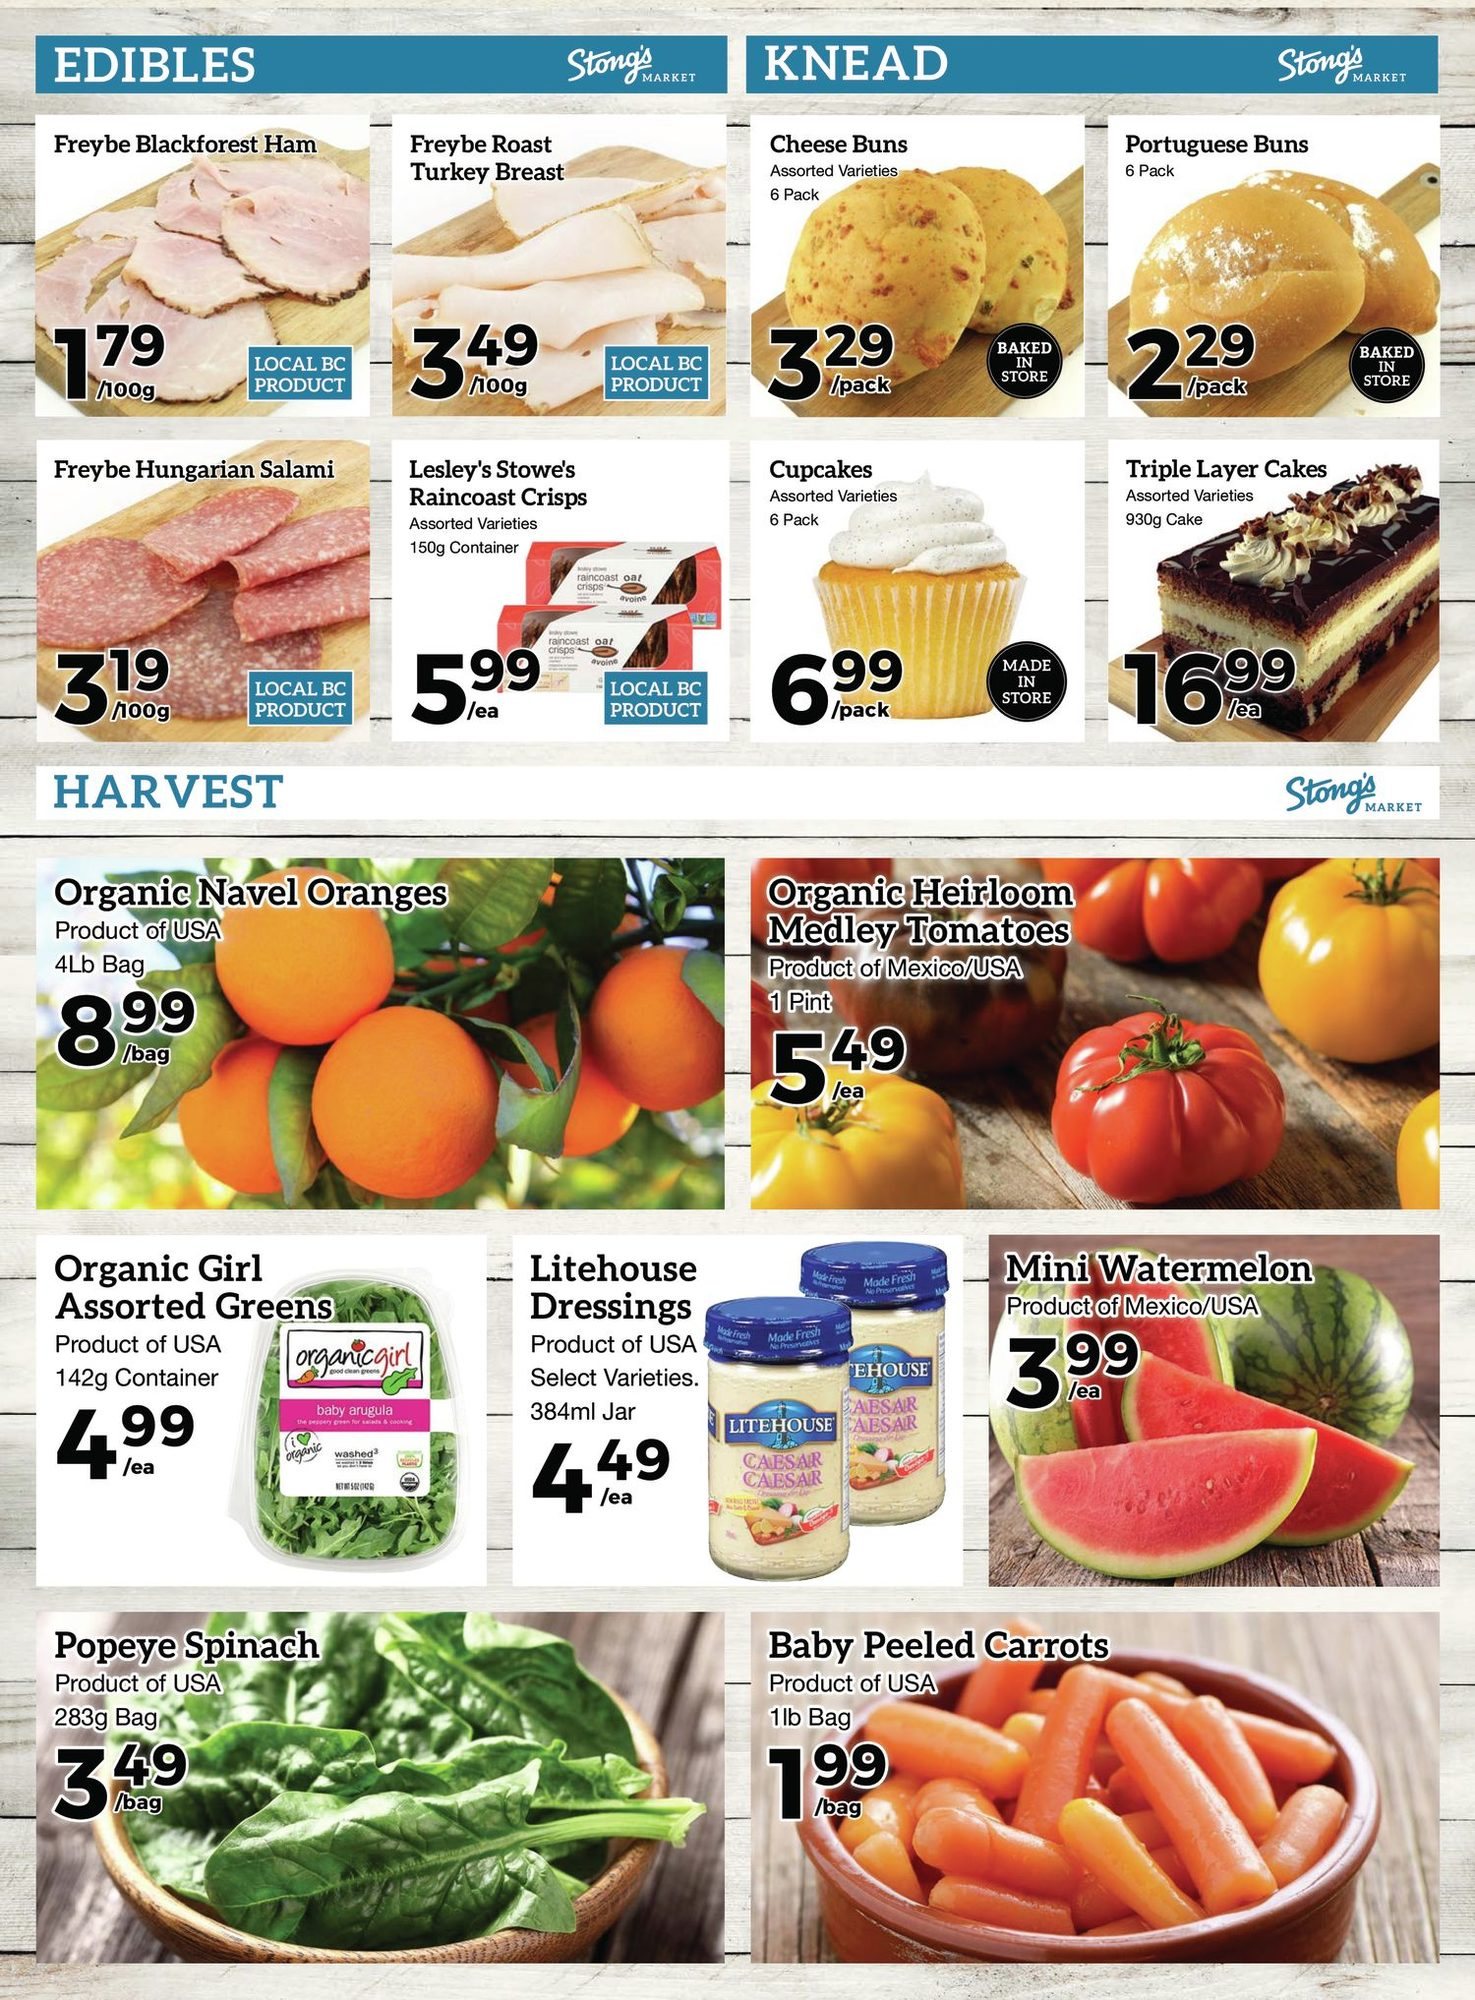 Stong's Market - 2 Weeks of Savings - Page 2